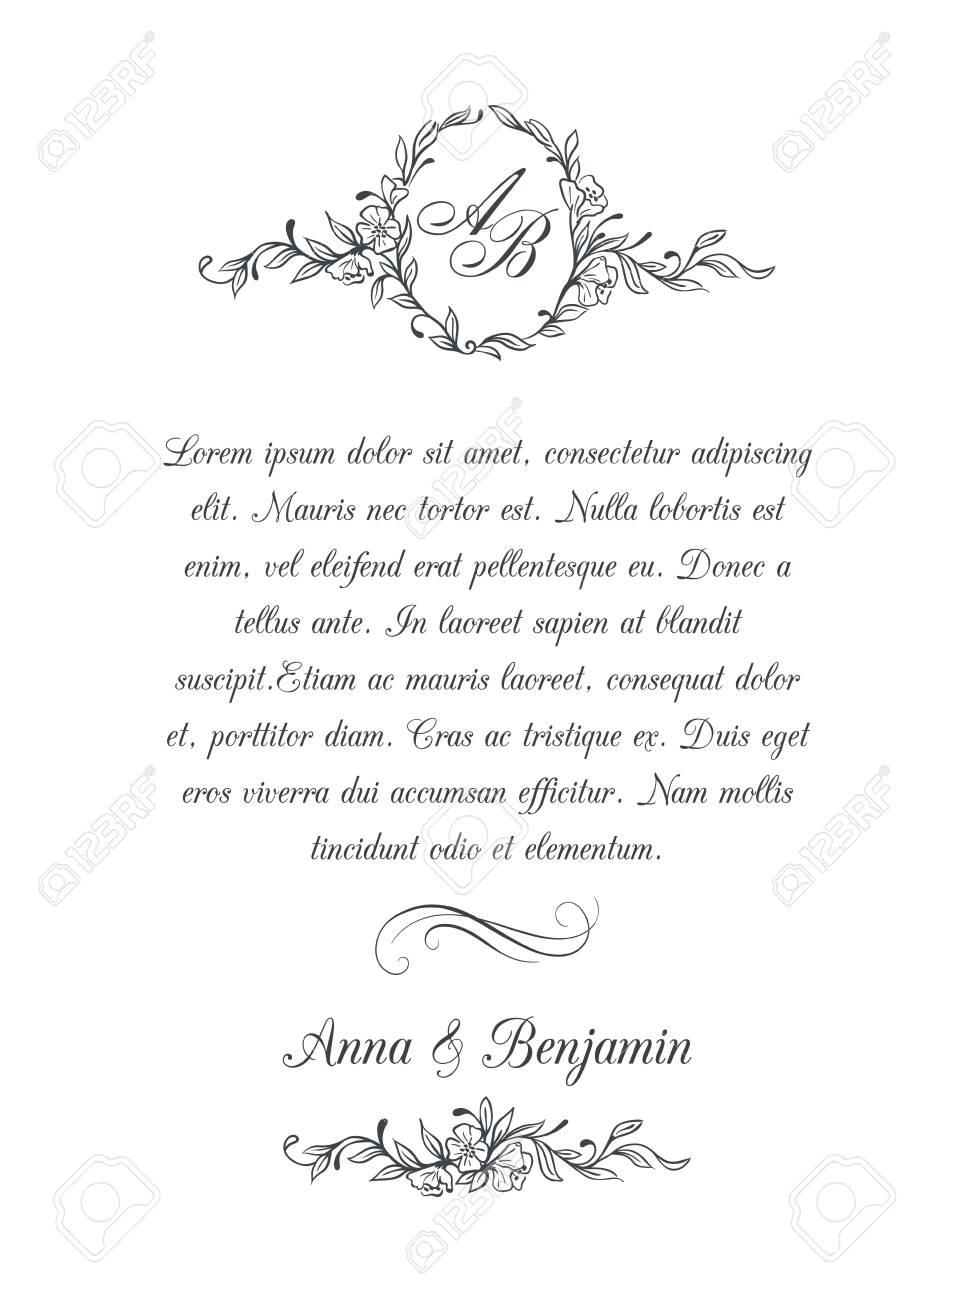 Wedding invitation with floral monogram - 134149687